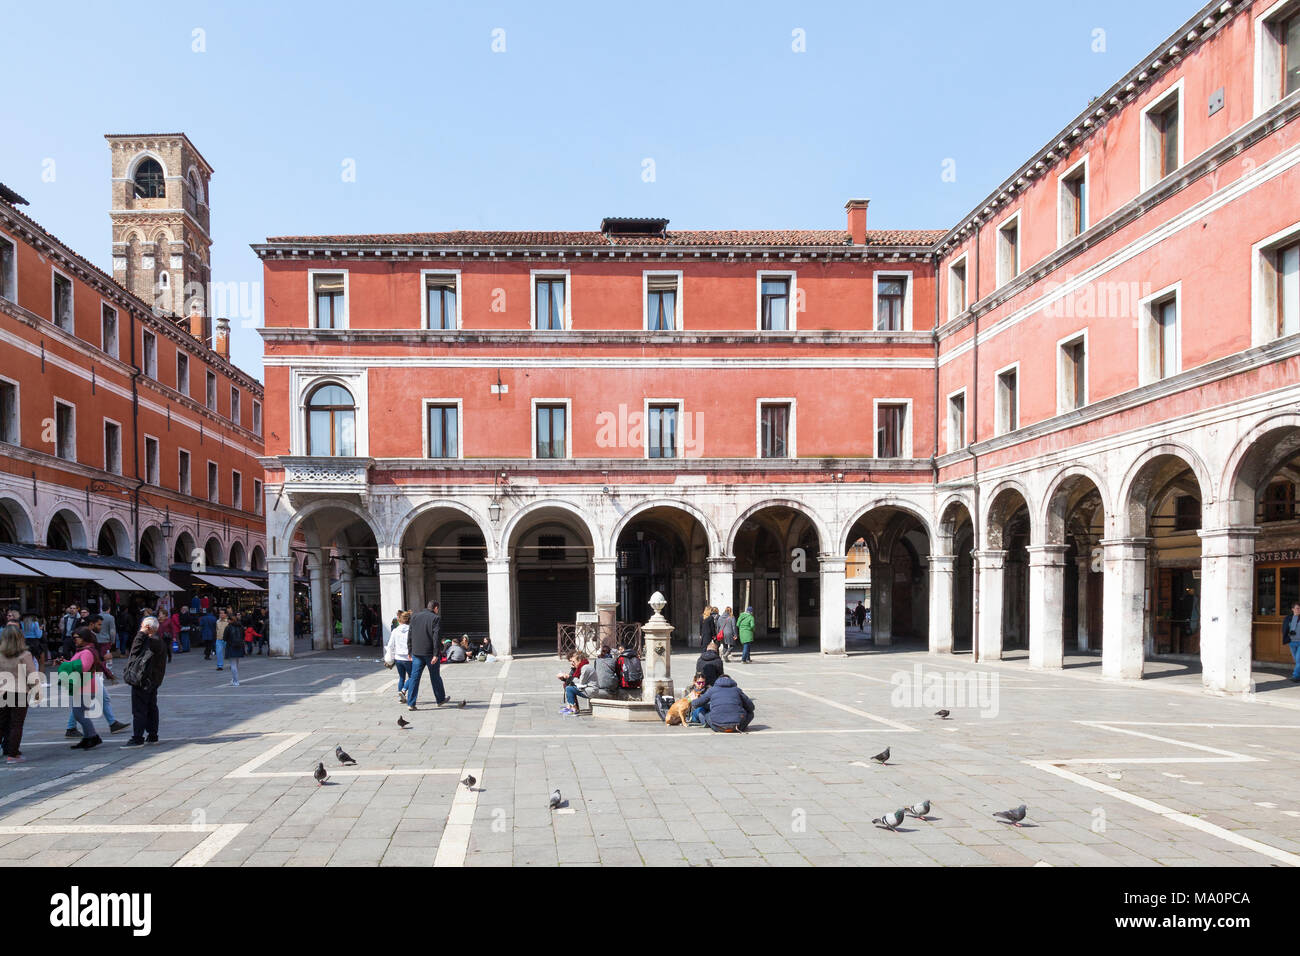 Campo San Giacomo di Rialto, Rialto, San Polo, Venice, Veneto, Italy with the statue of Il Gobbo di Rialto at the back  and people enjoying the spring - Stock Image